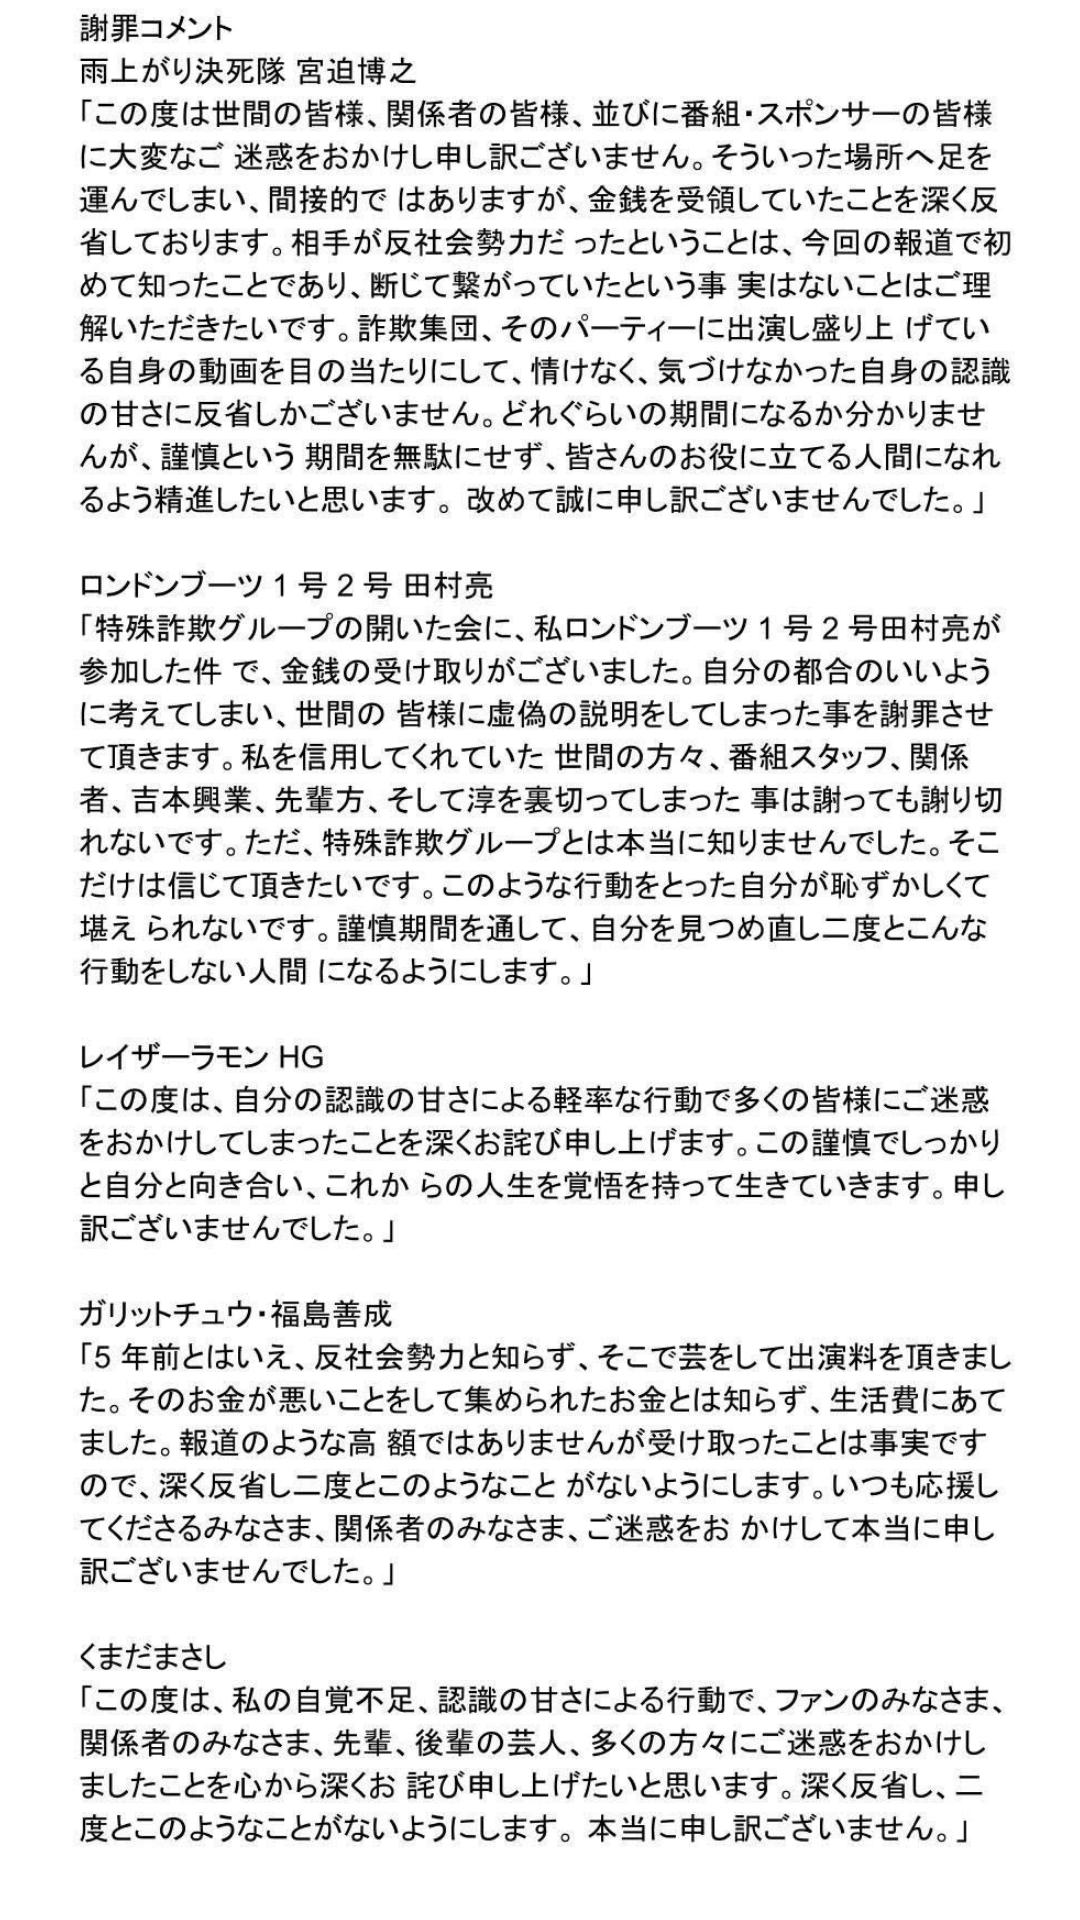 tamuraatsushi